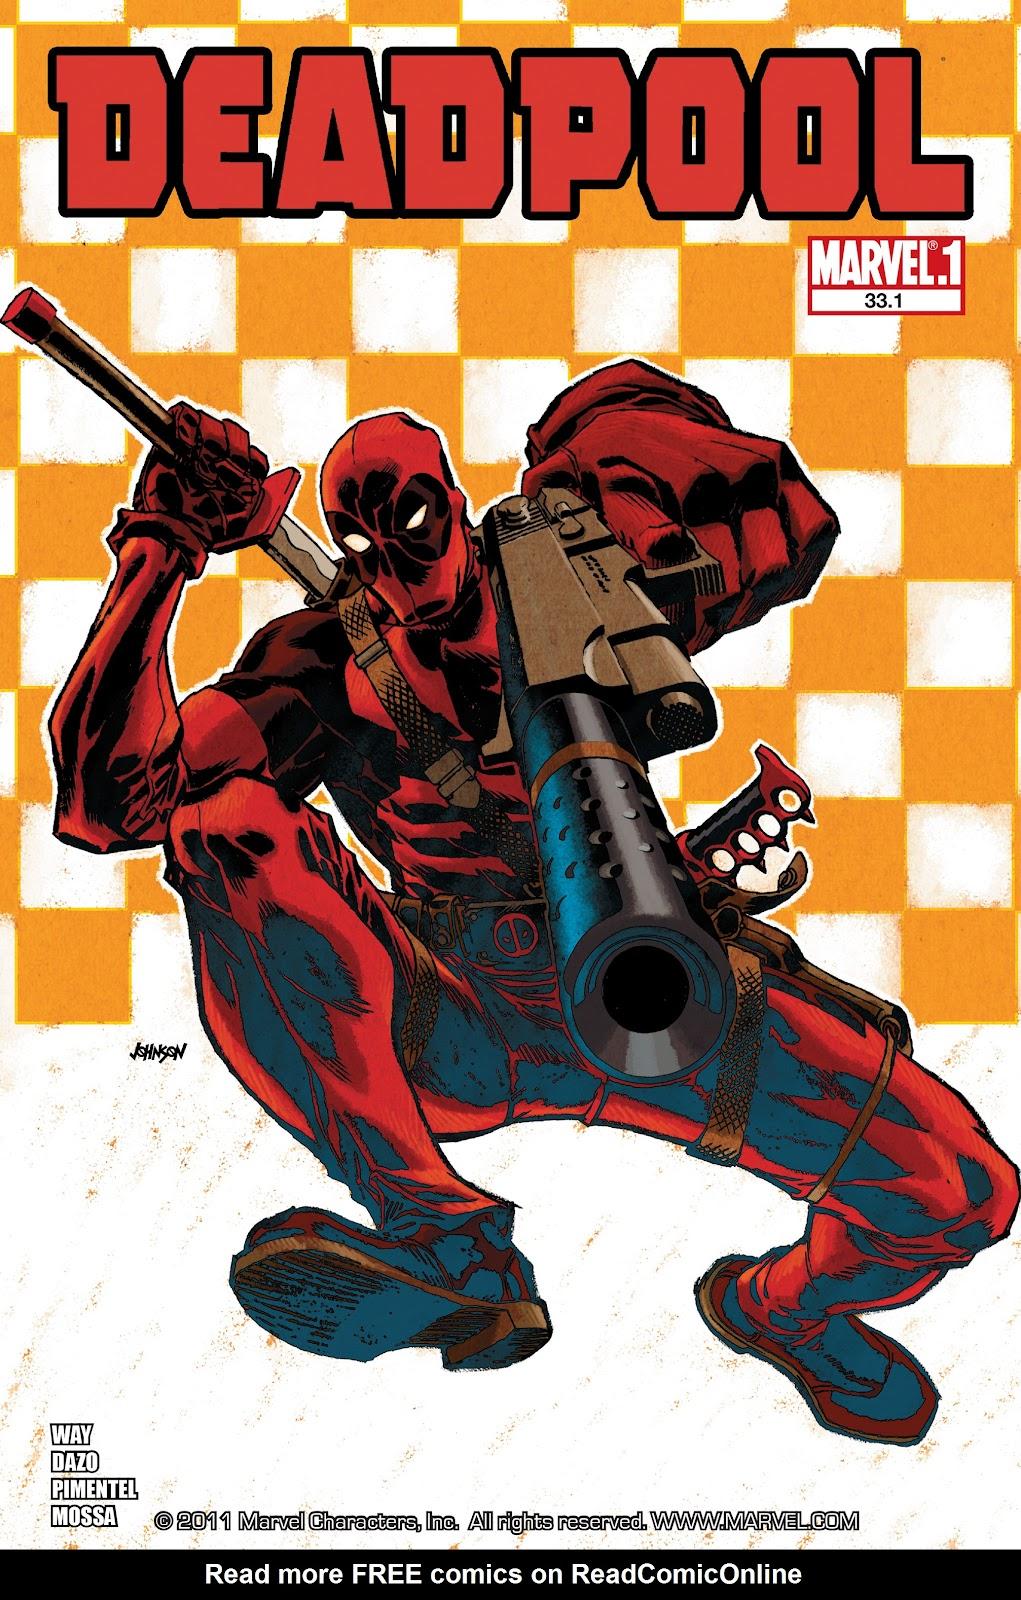 Read online Deadpool (2008) comic -  Issue #33.1 - 1